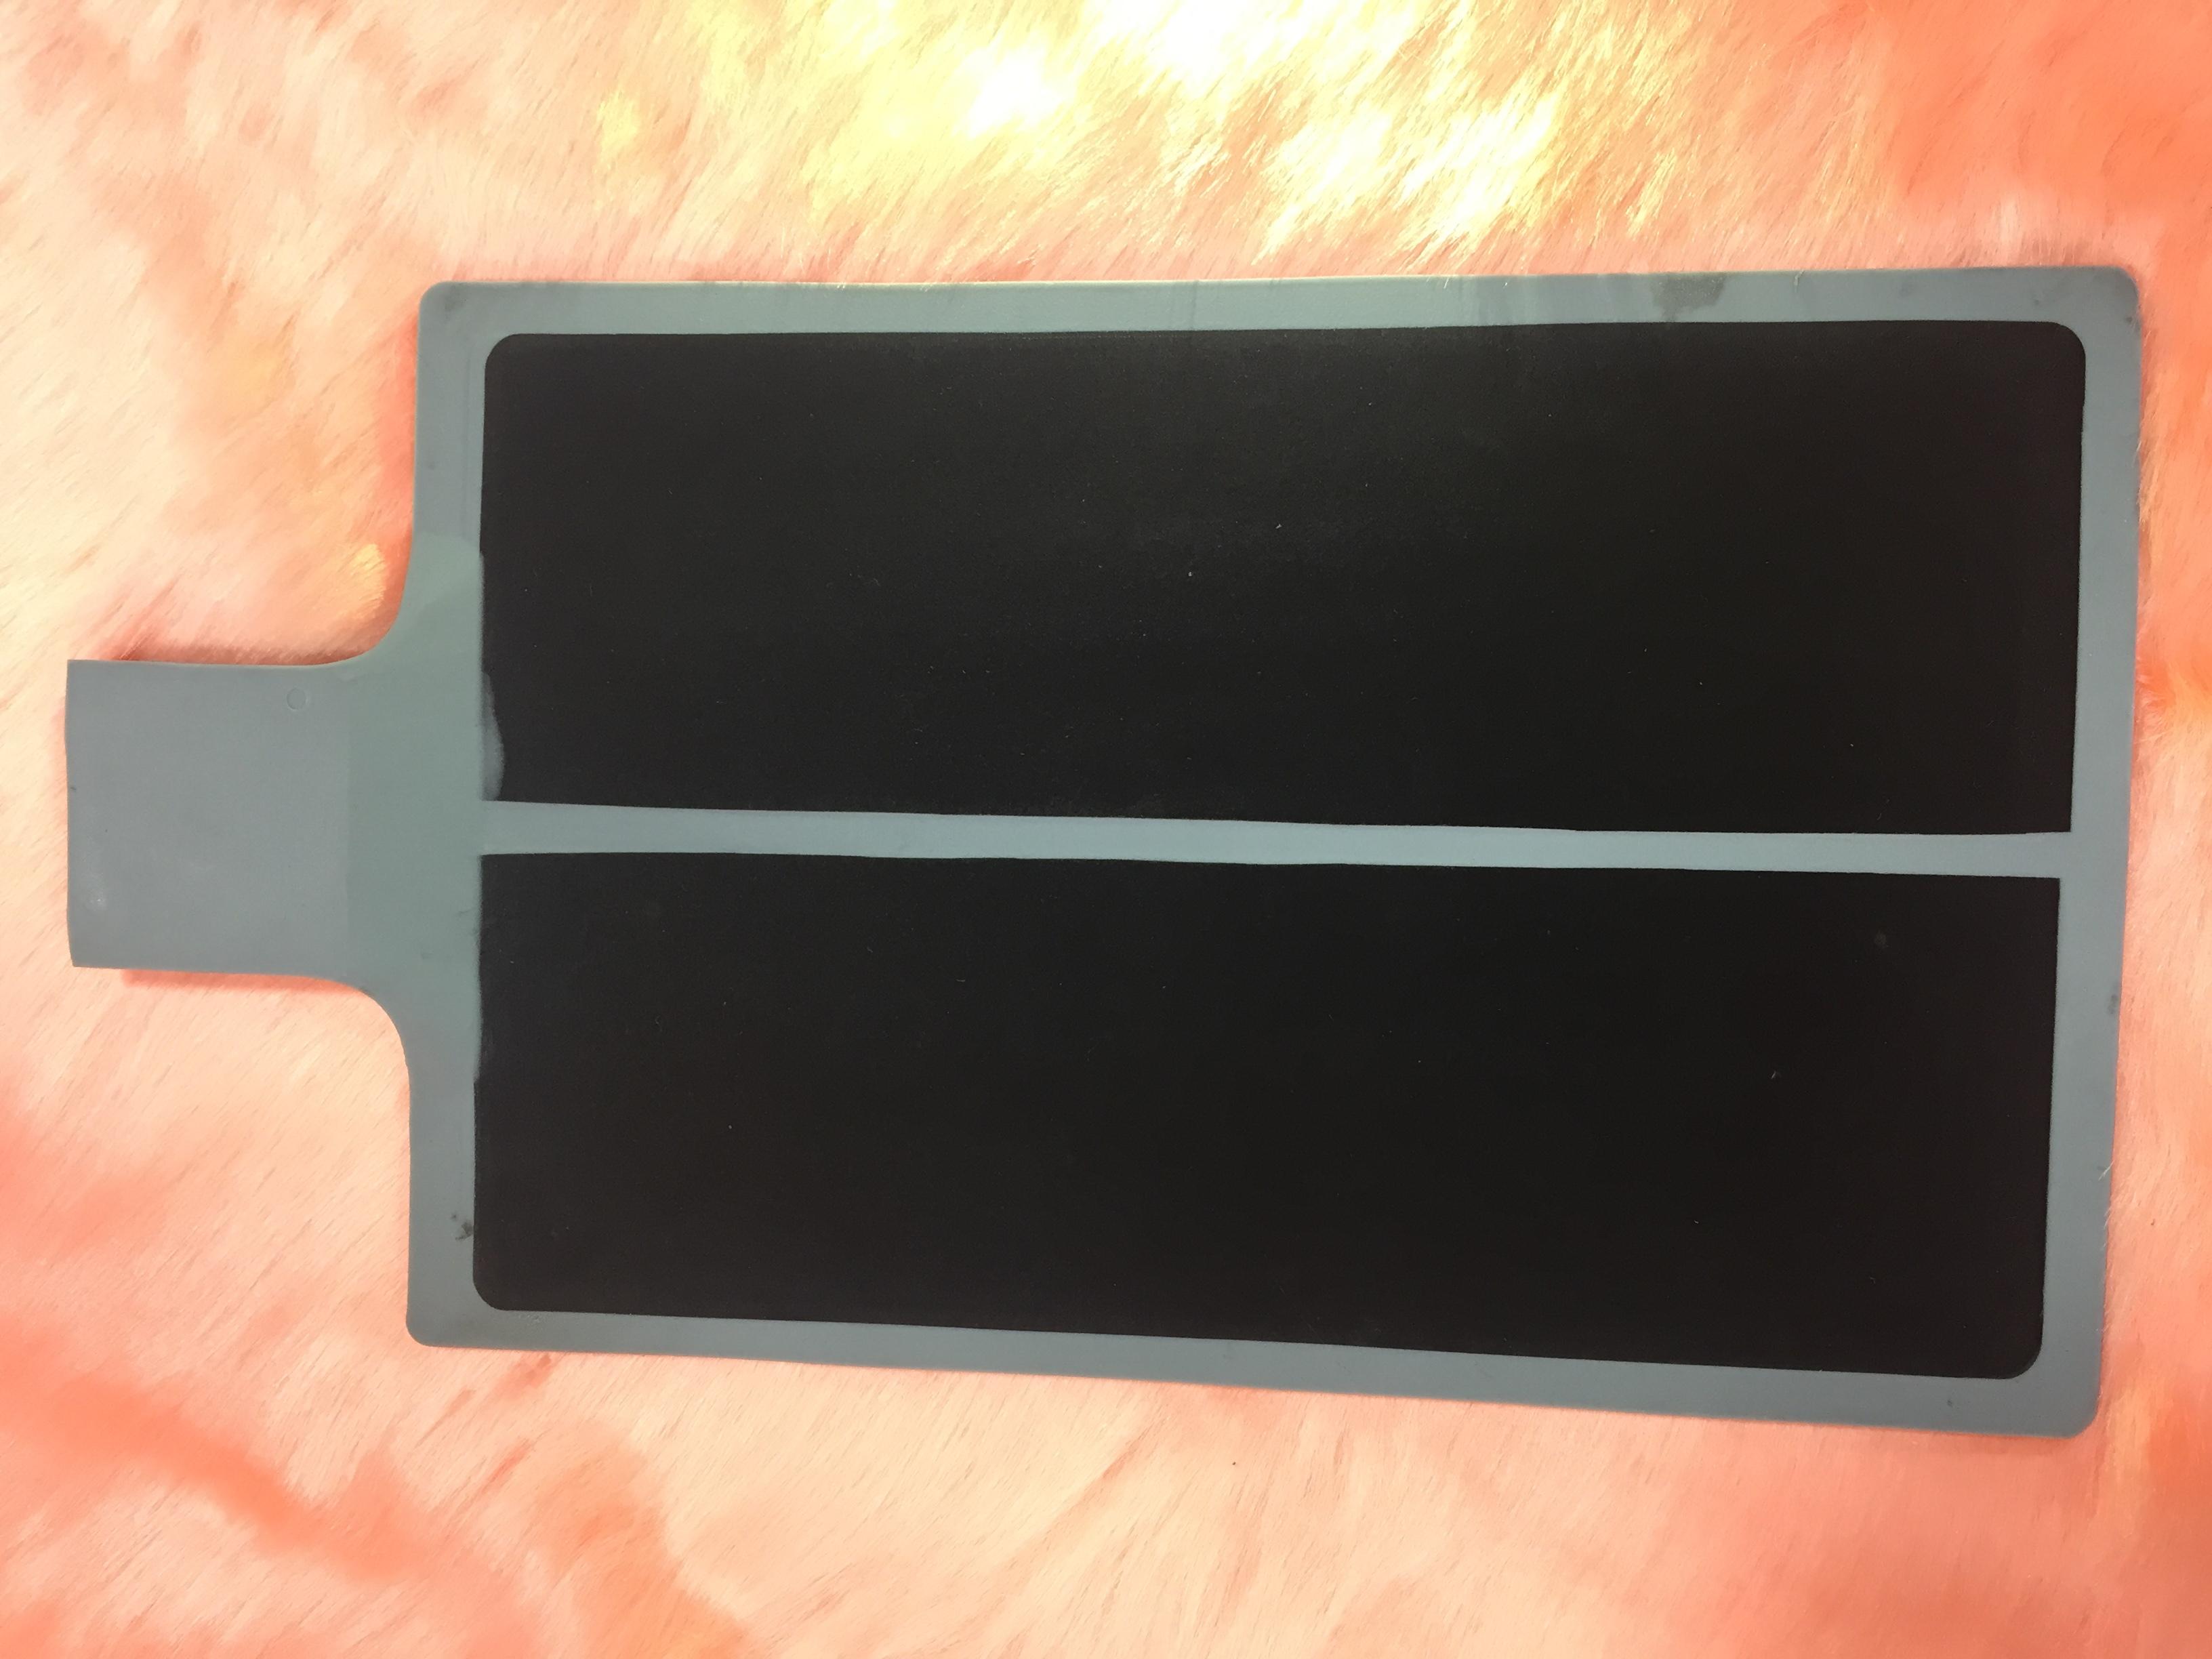 Silicon Patient Plate (spilt type)